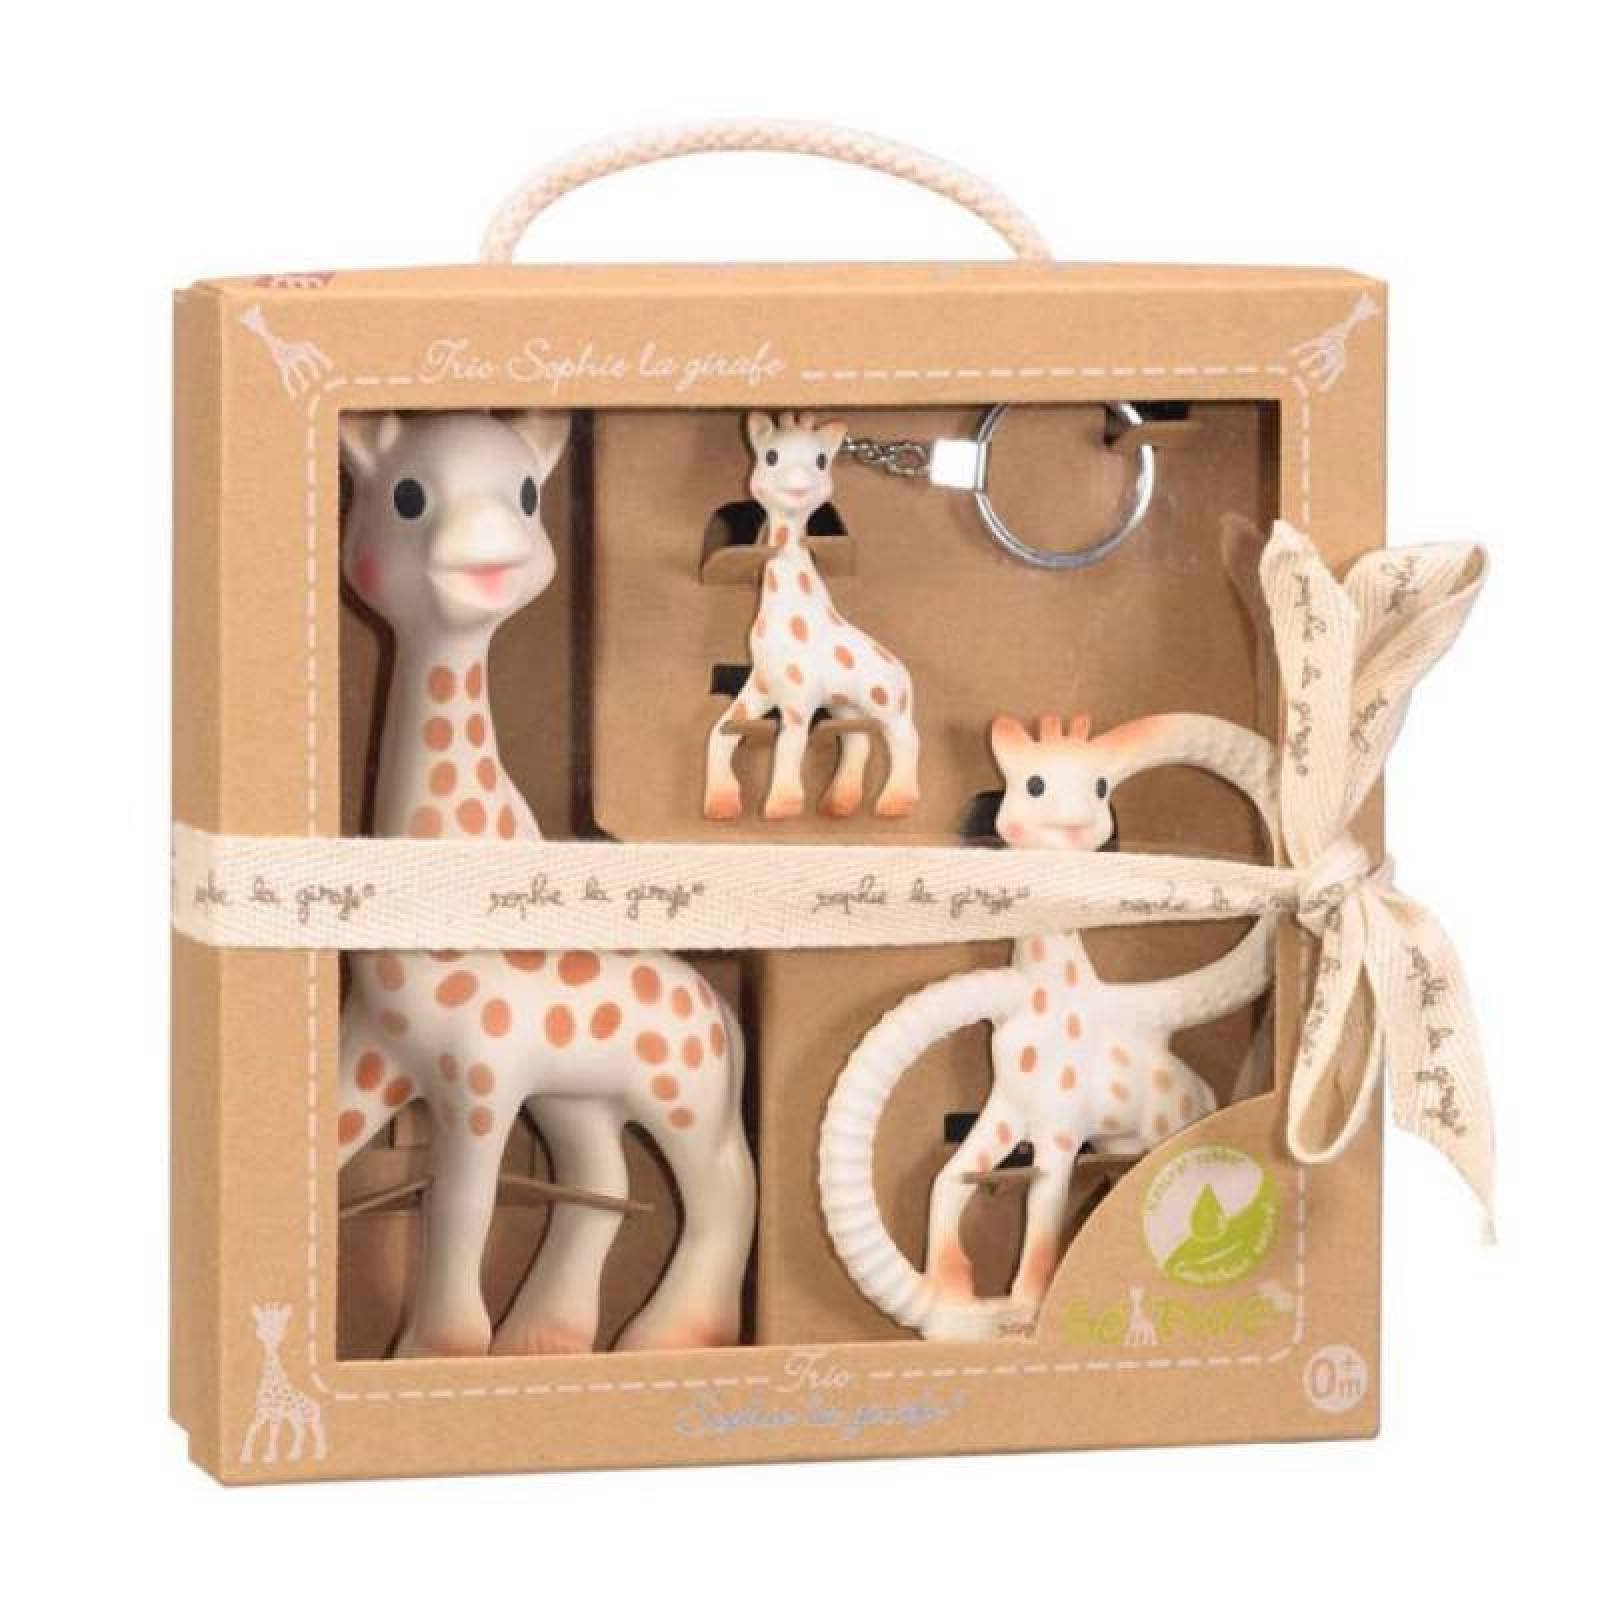 Sophie La Girafe/ The Giraffe Trio Boxed Gift Set